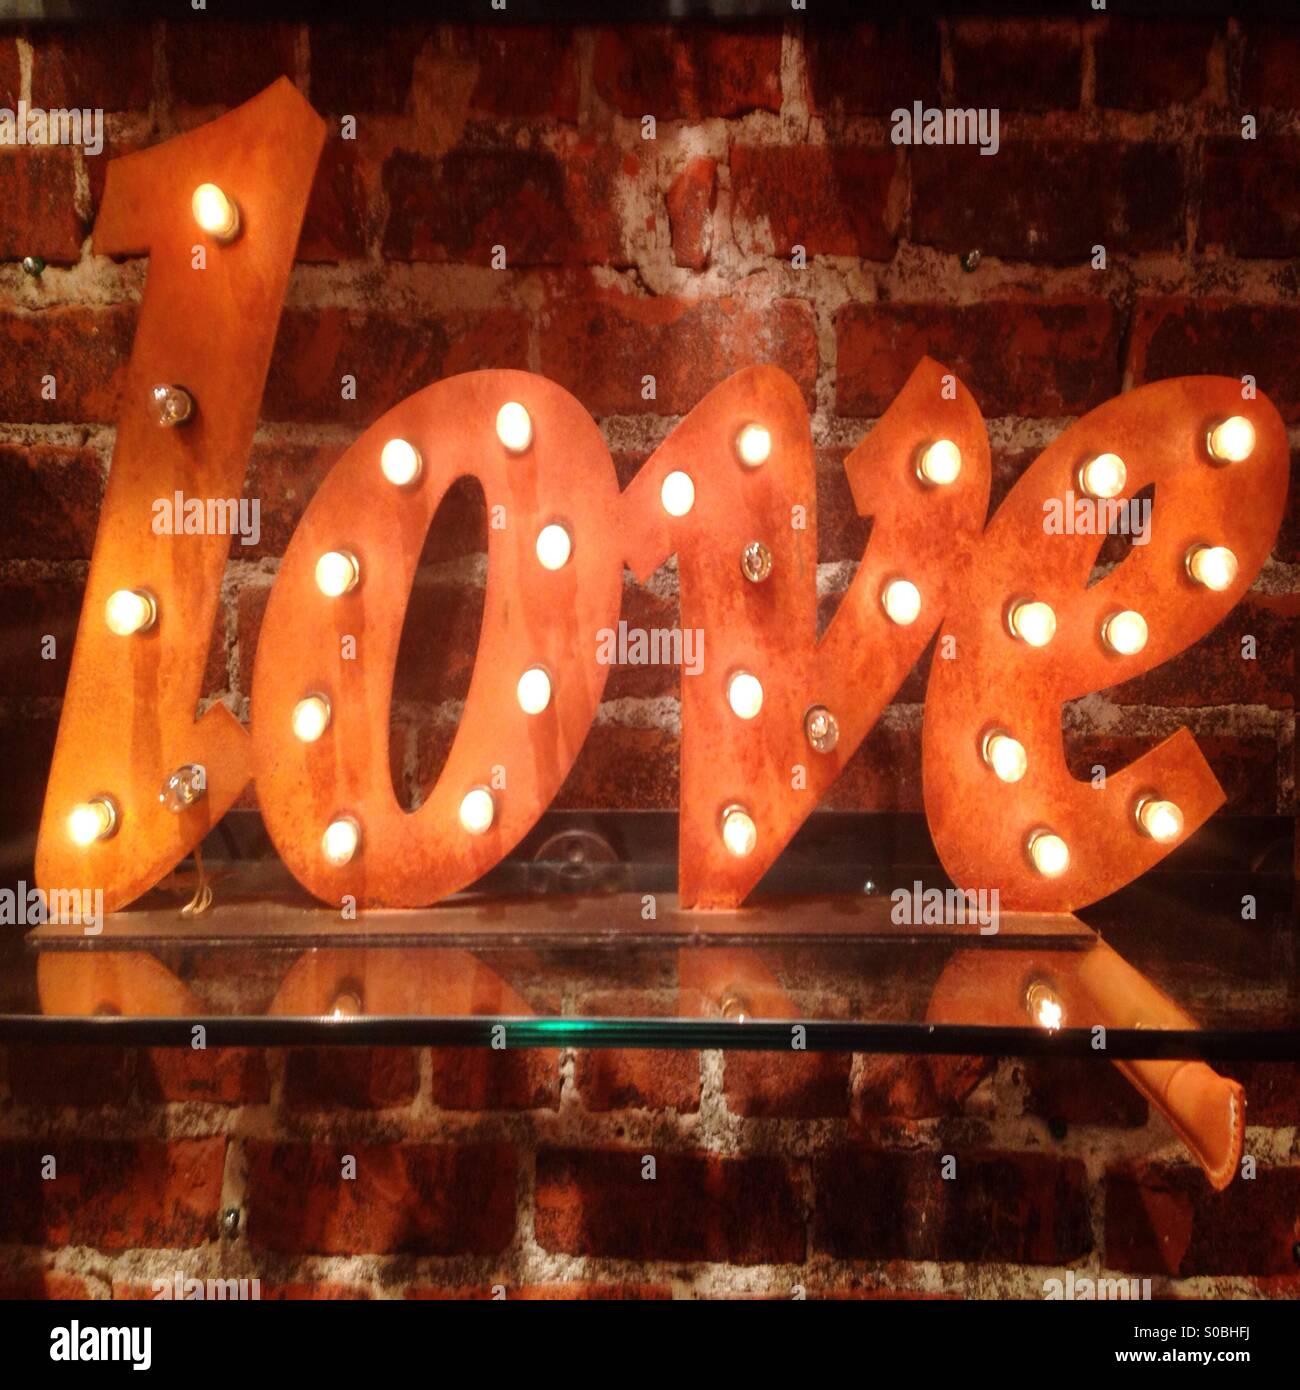 Liebe Leuchtreklame Stockbild